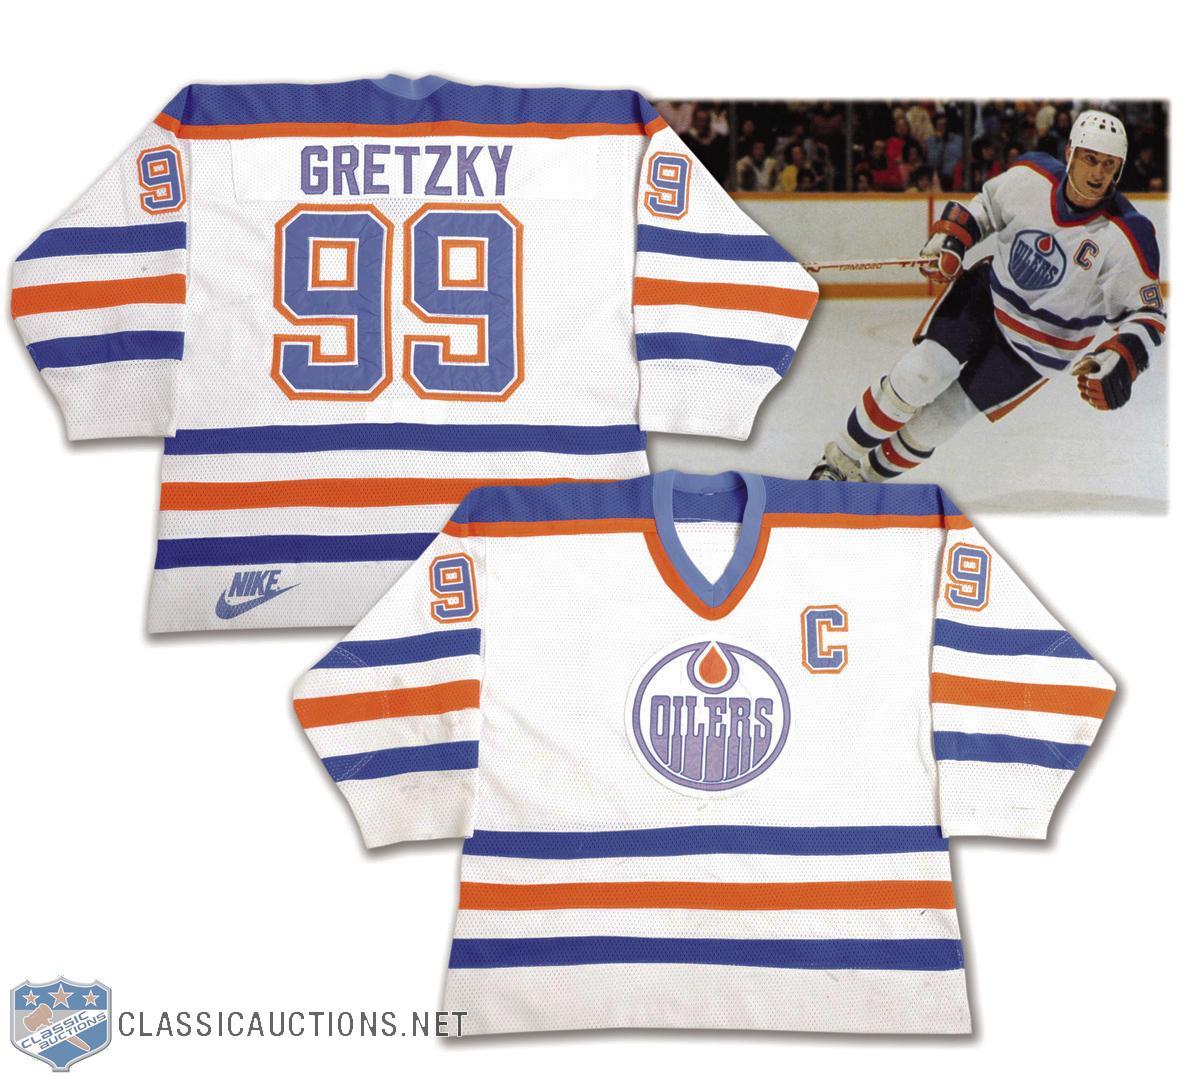 online store 27462 a6a46 Wayne Gretzky's 1985-86 Edmonton Oilers Captains Playoffs ...